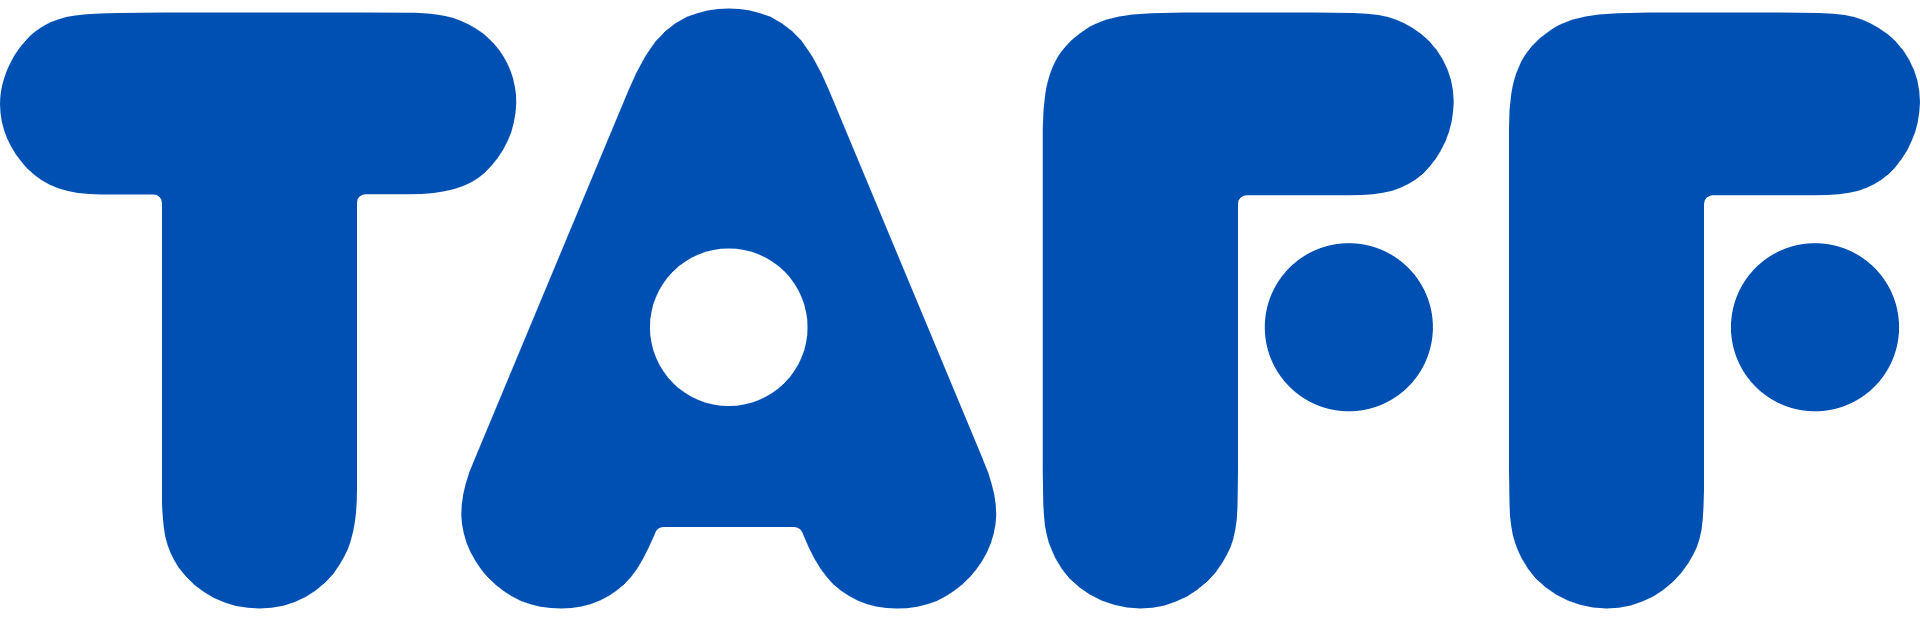 Taff Housing Association Logo